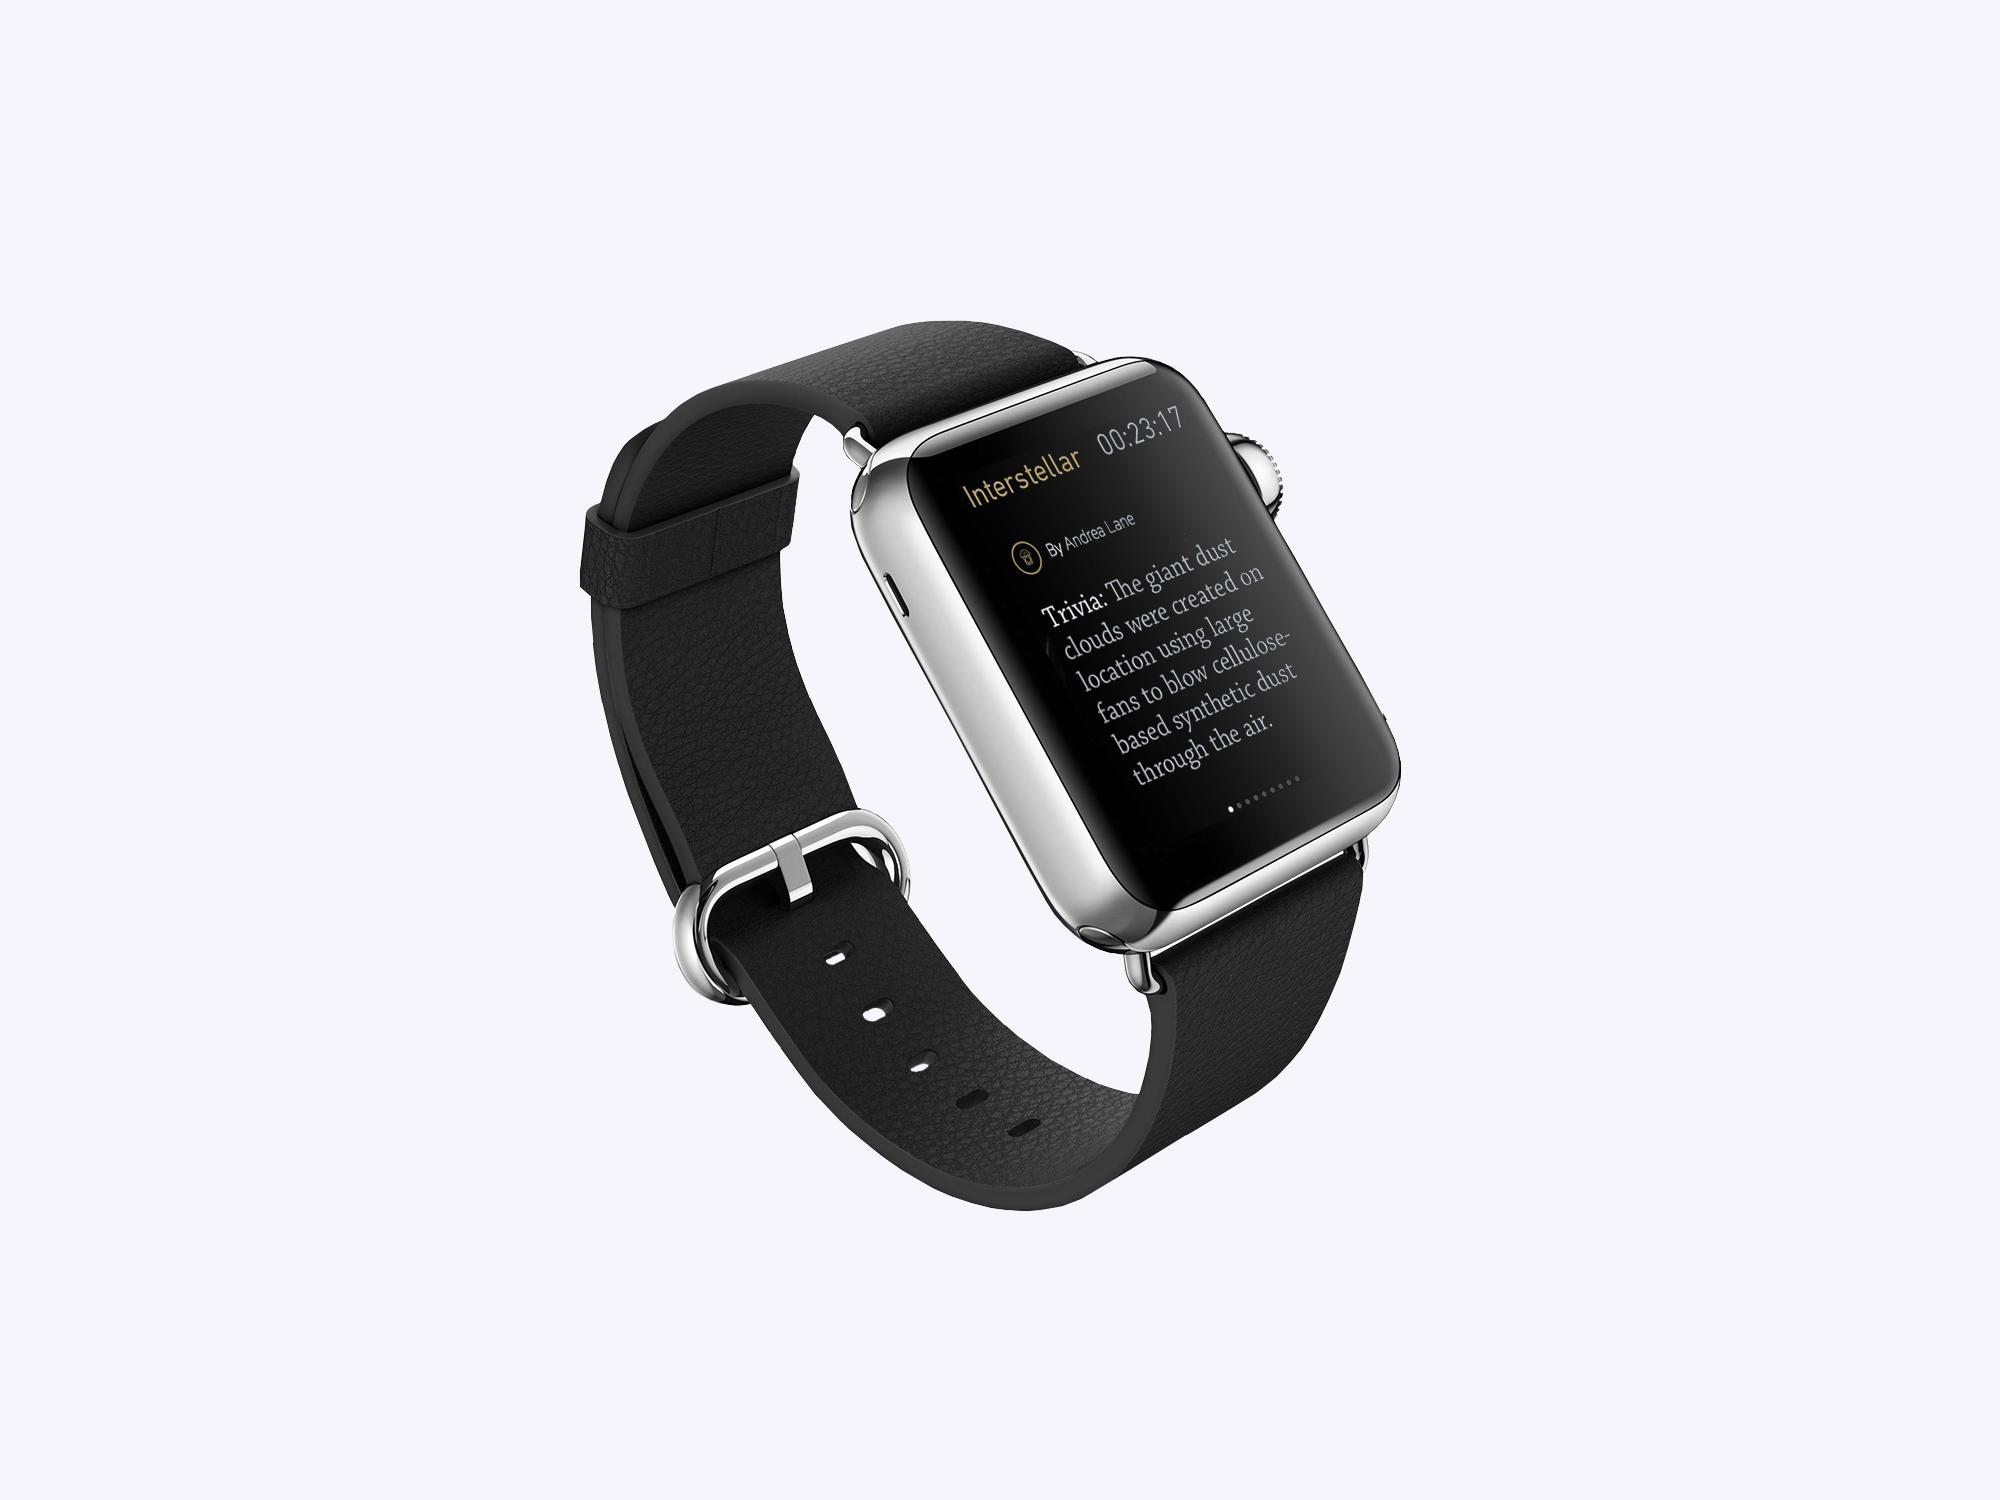 andreas-weiland-watch